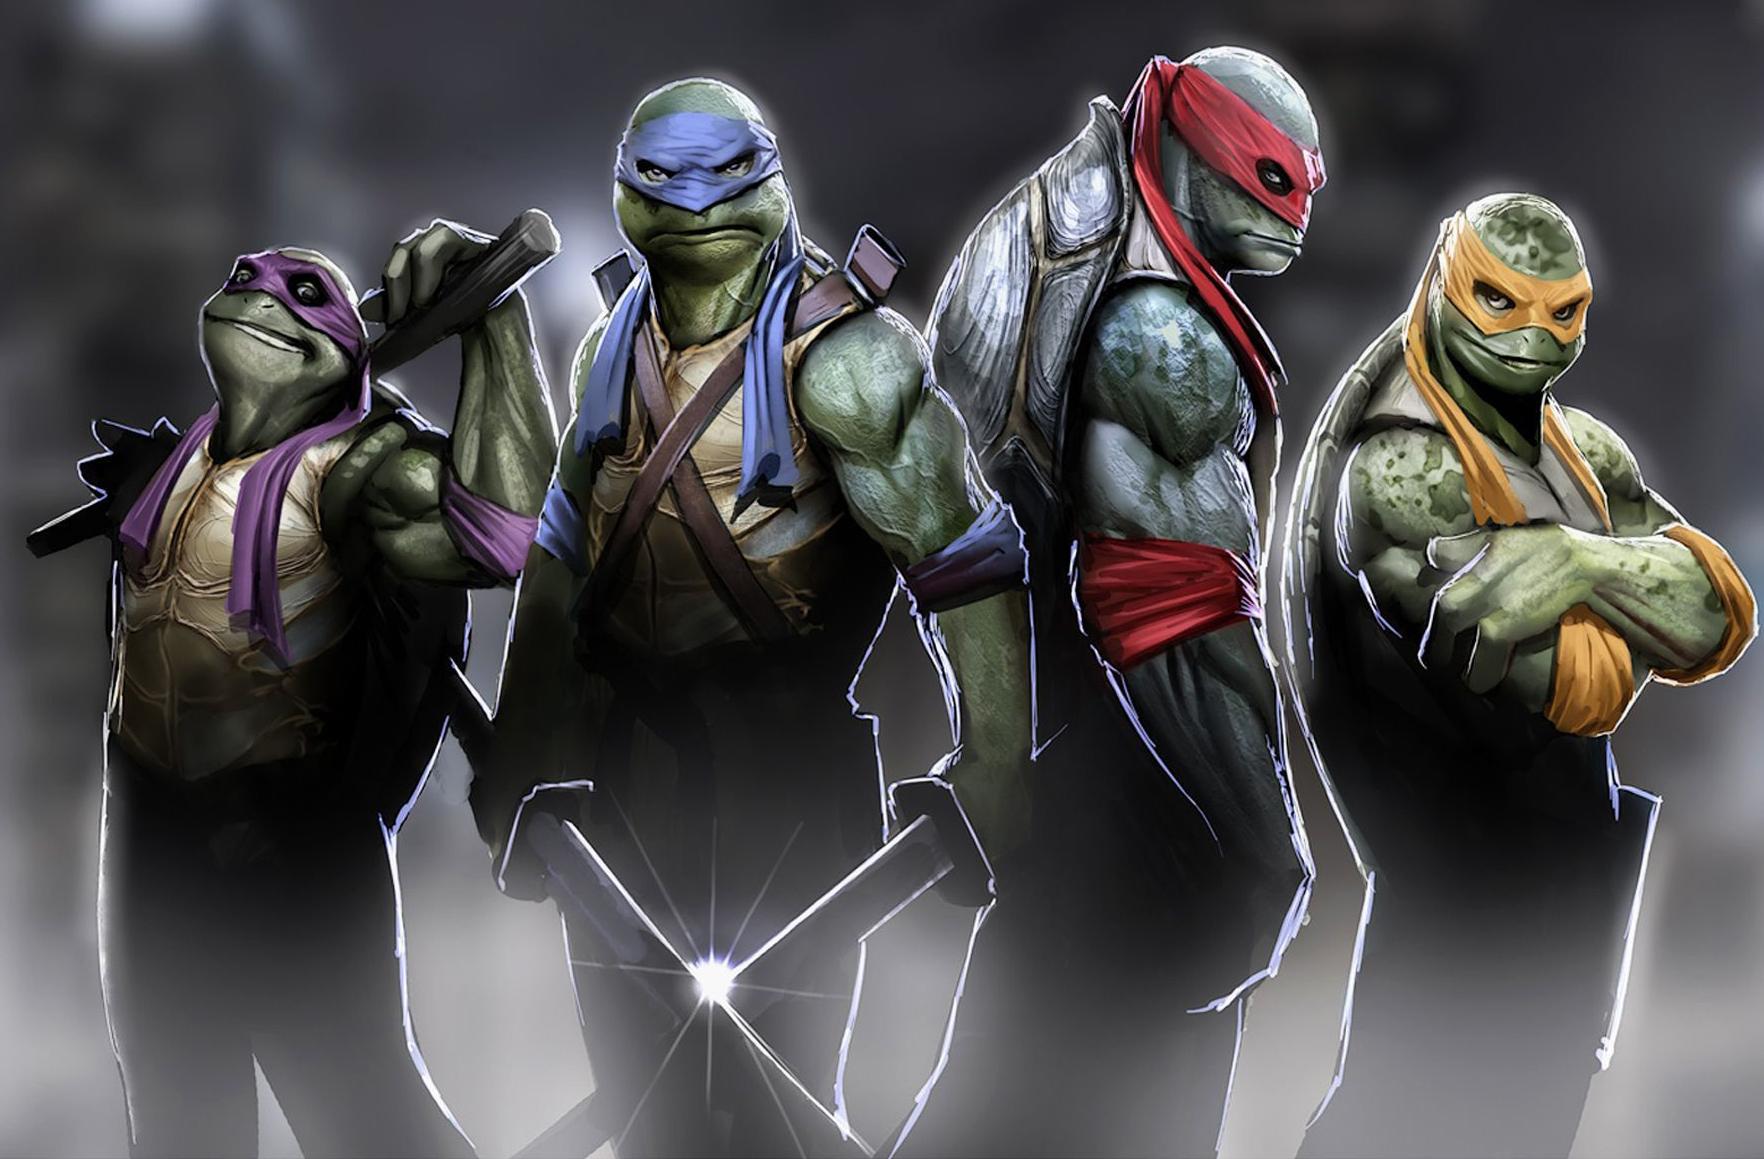 teenage-mutant-ninja-turtles-1st-trailer-review